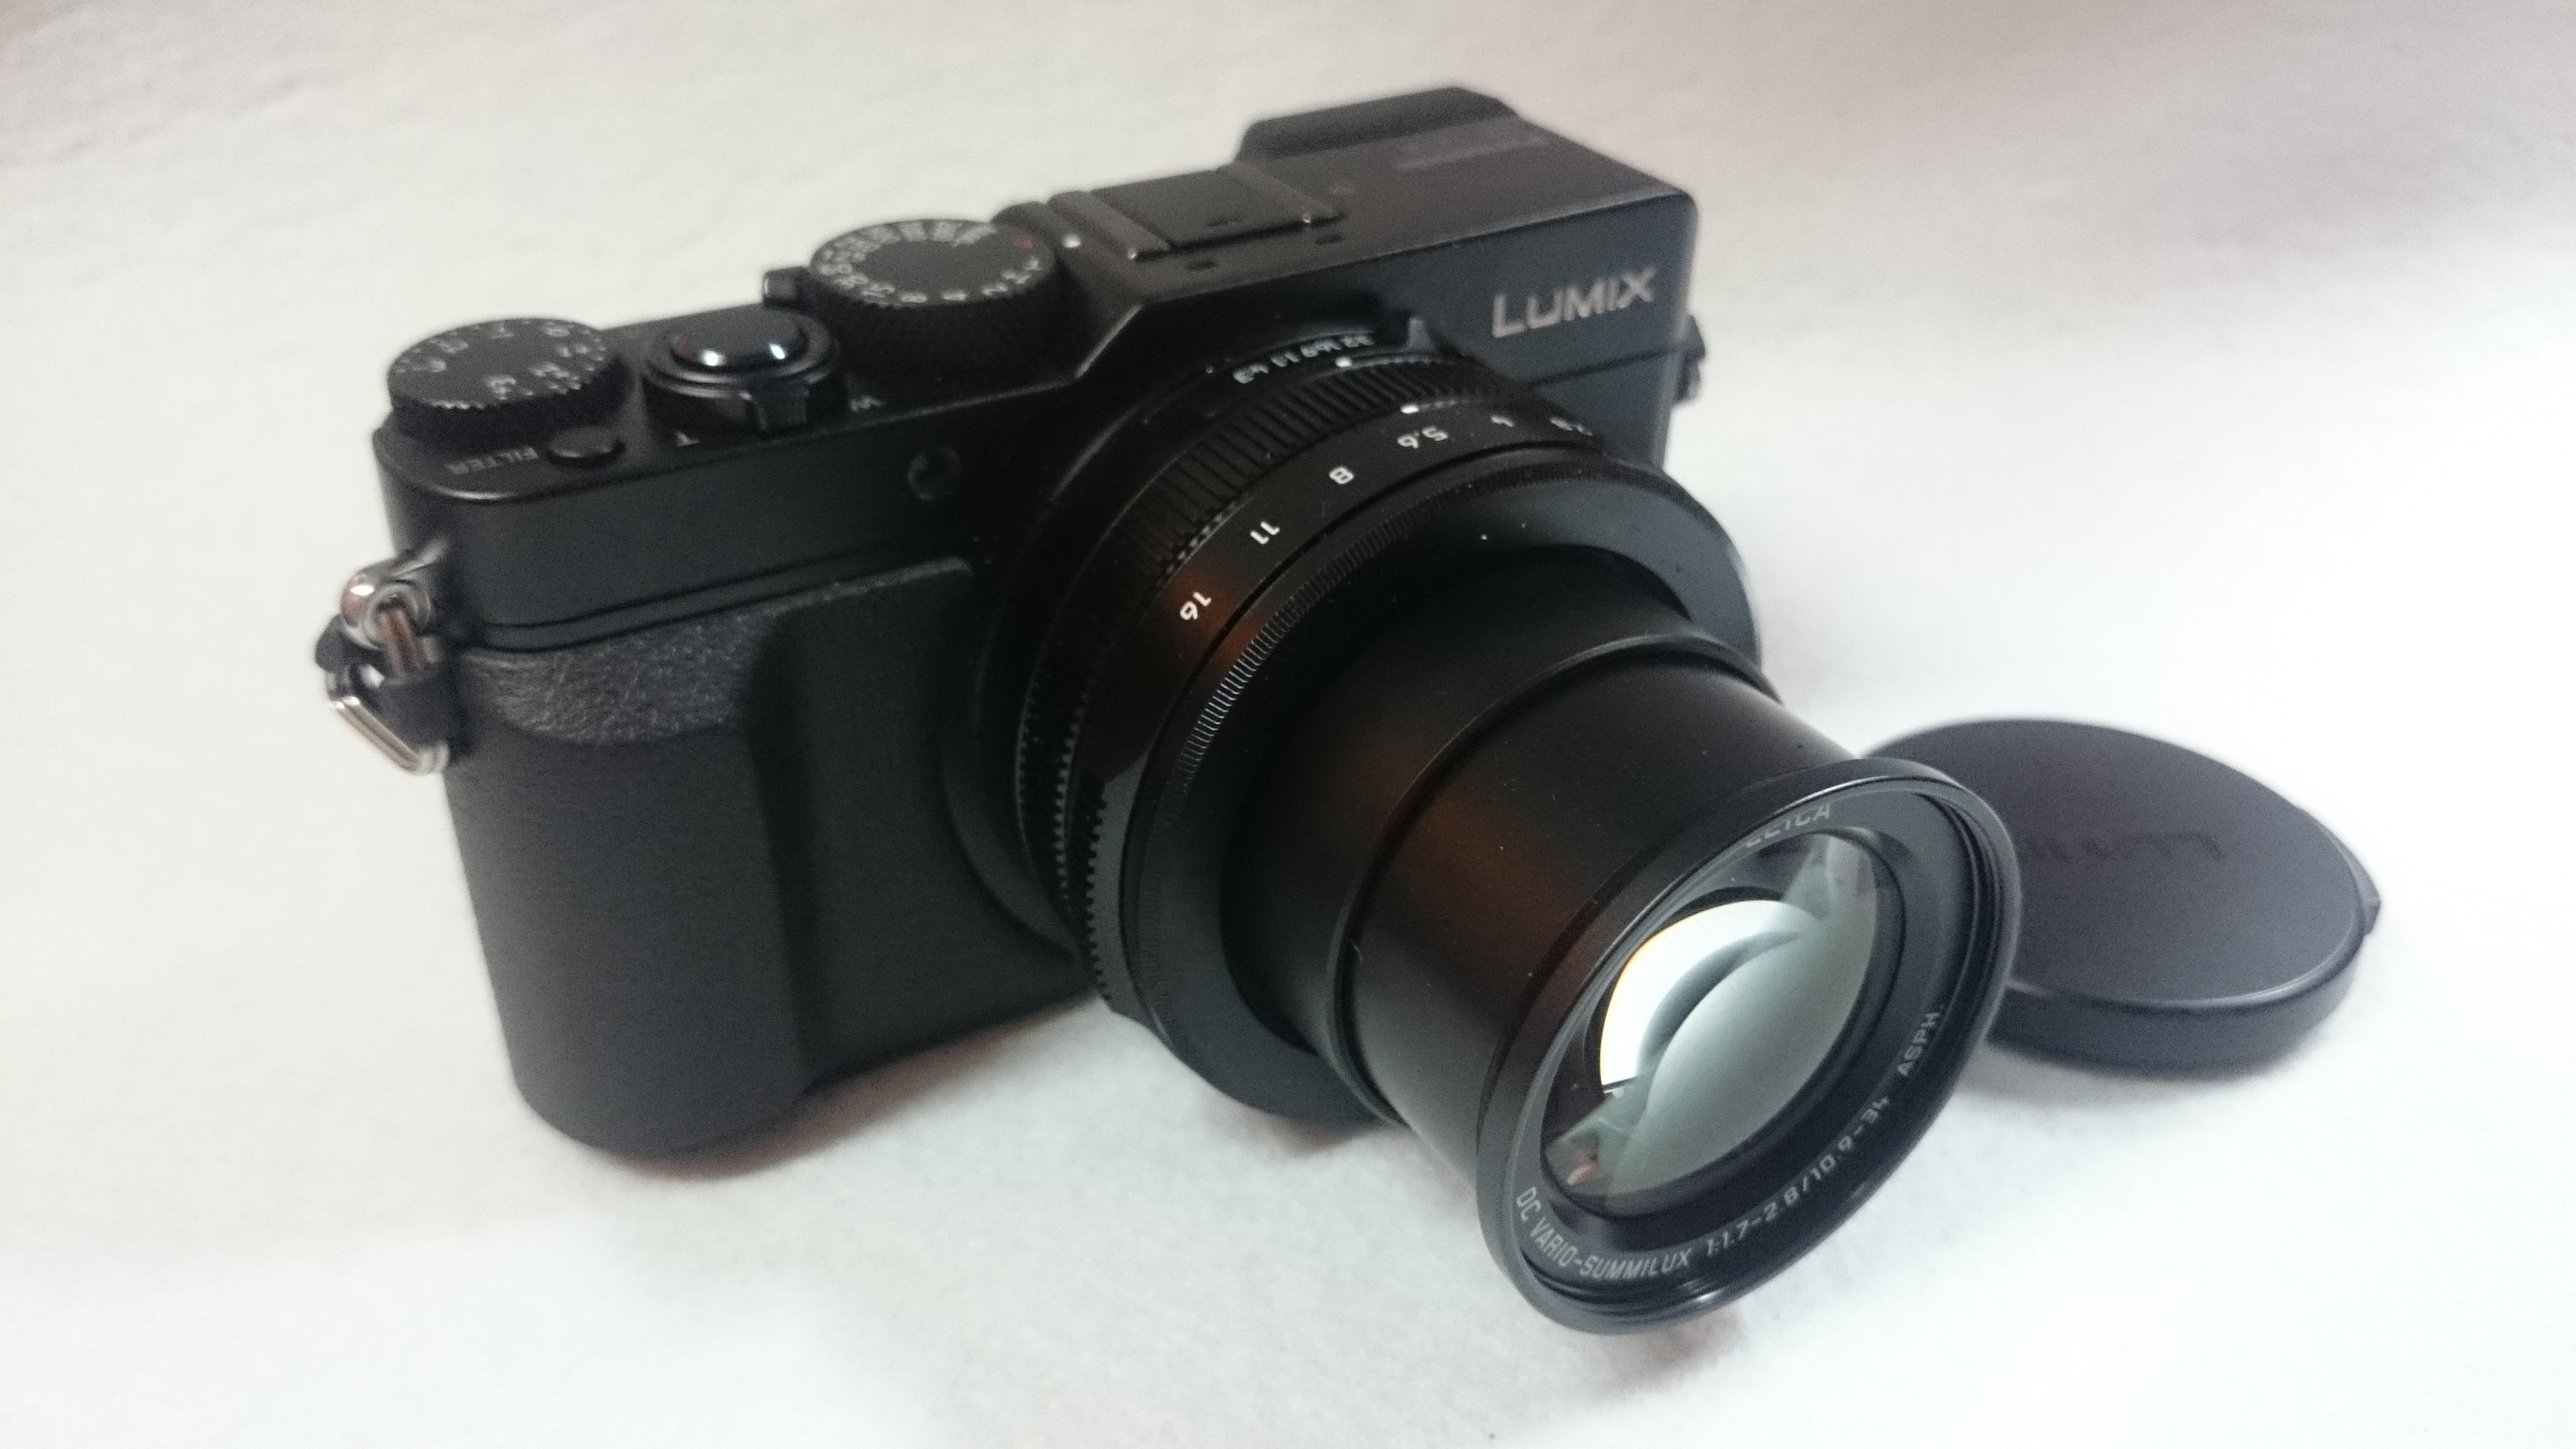 Probamos la Panasonic Lumix LX-100 4K!!!!